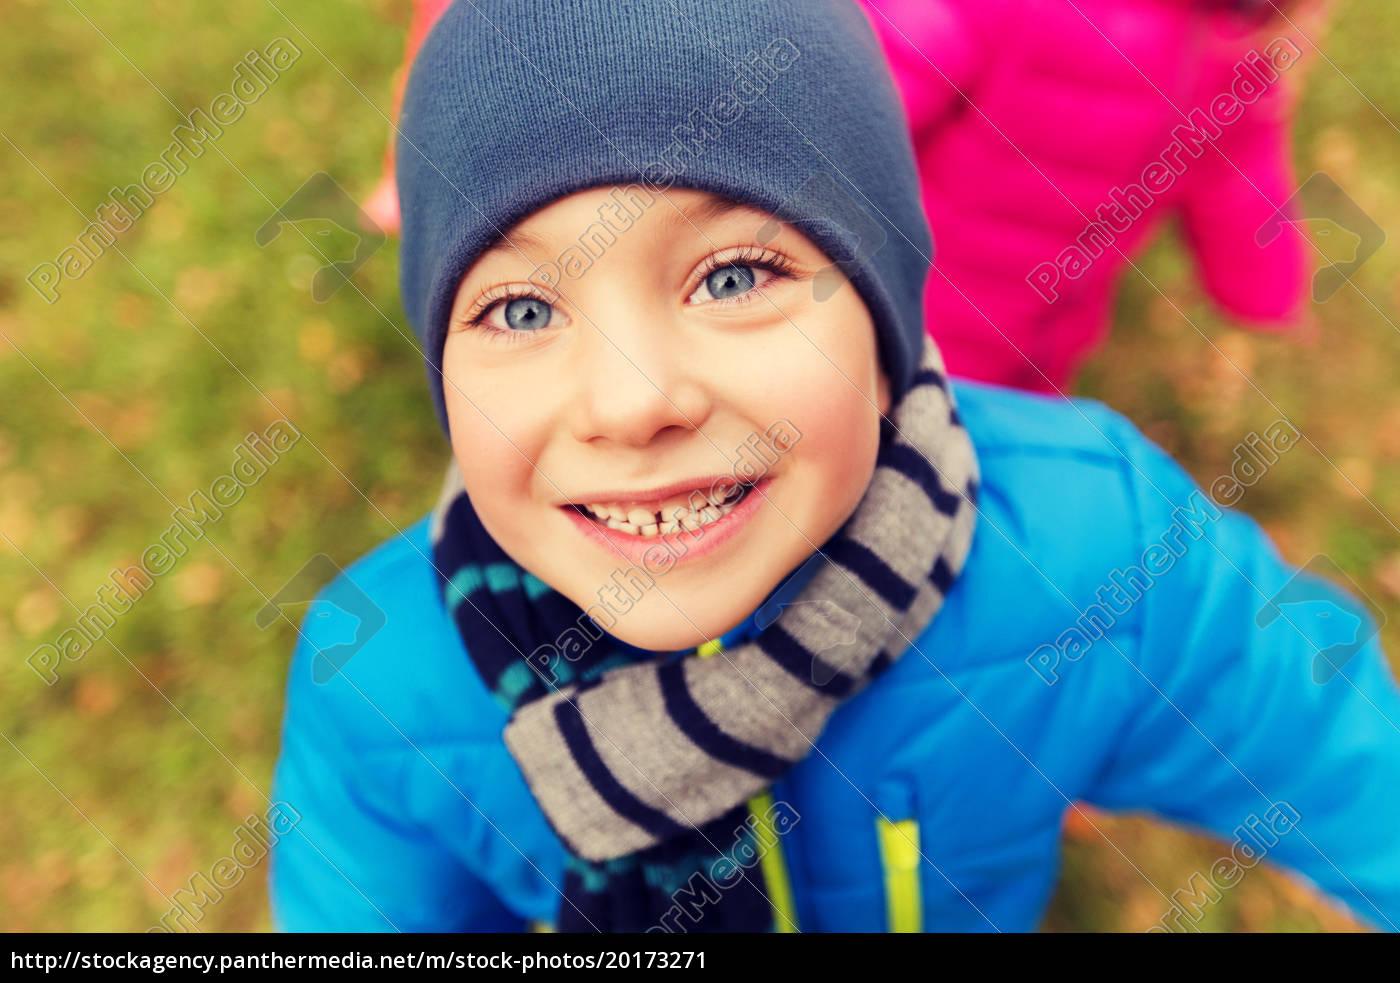 happy, little, boy, face, outdoors - 20173271